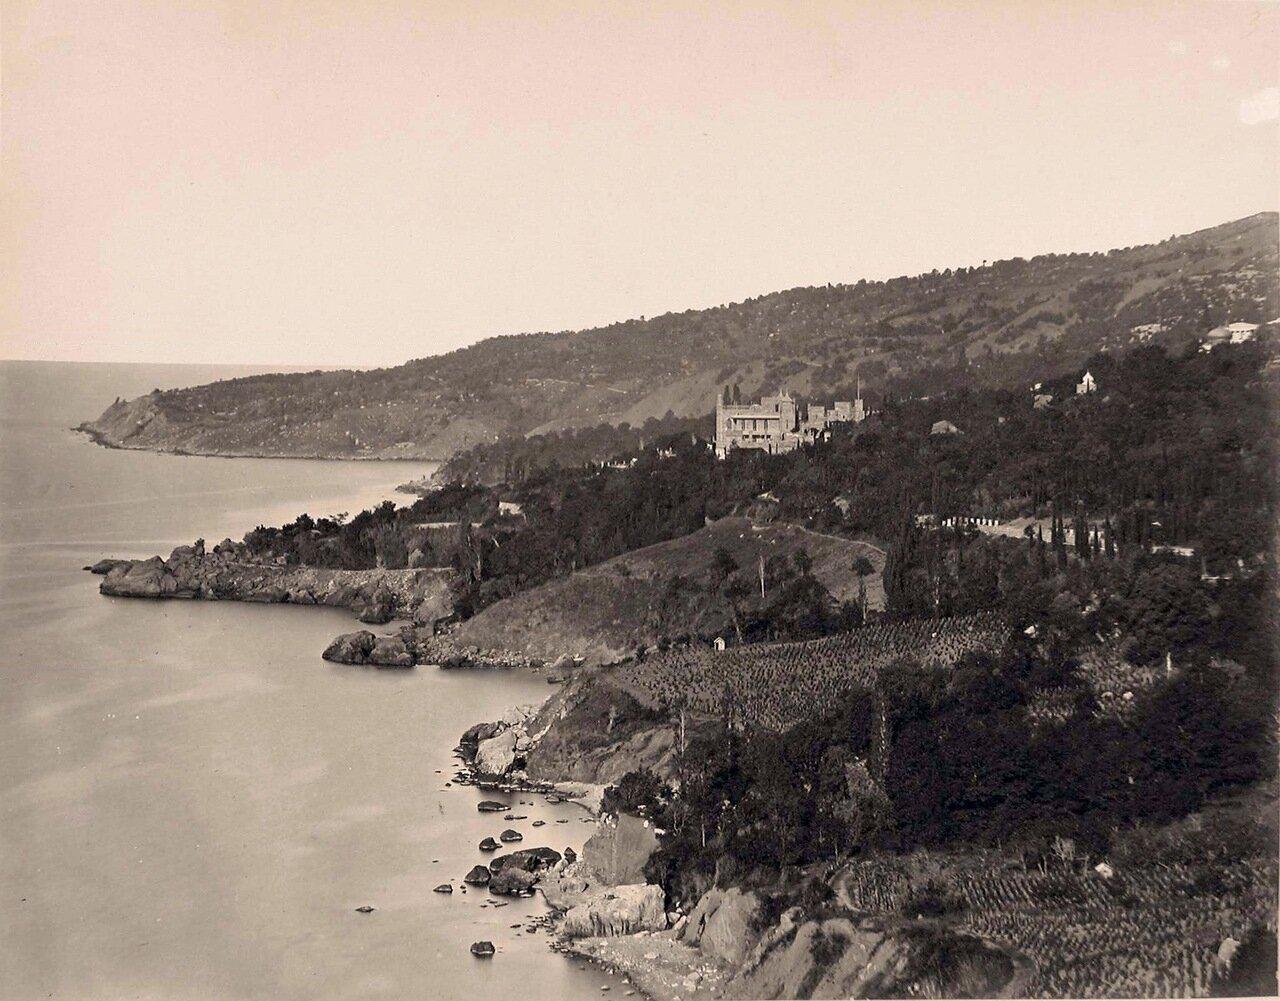 Вид на дворец графа М.С.Воронцова (архитектор Эдуард Блор, 1828-1848 гг.)